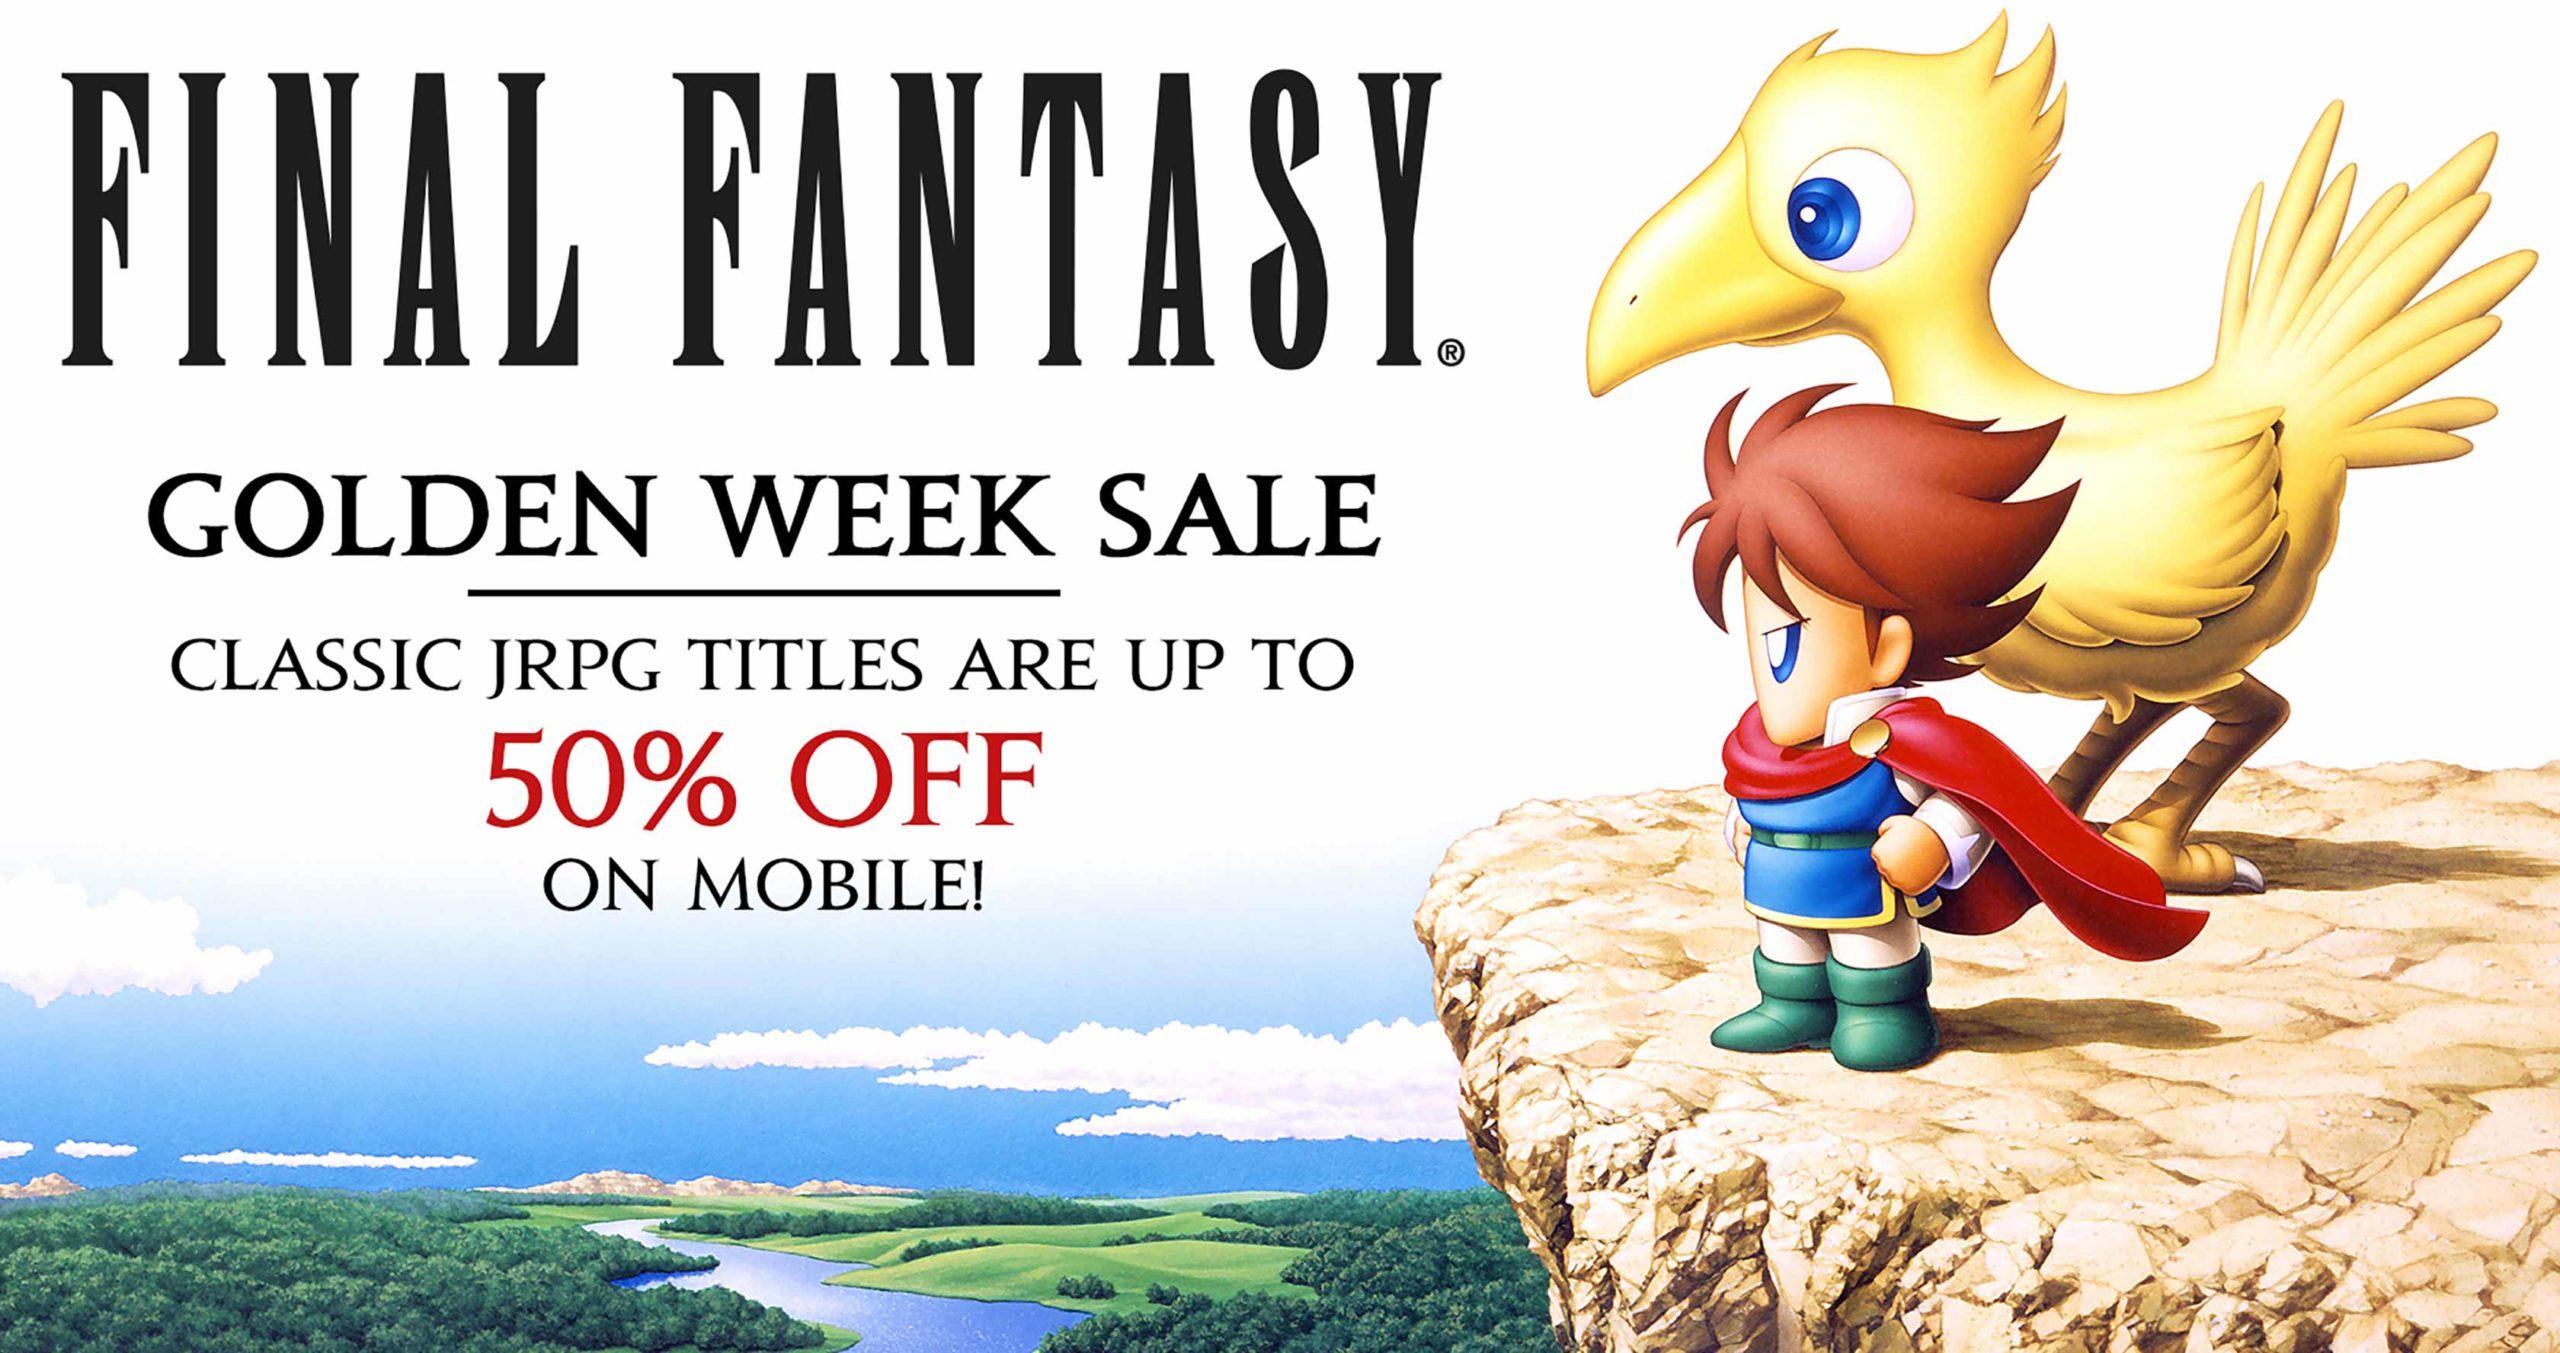 Final Fantasy Golden Week sale